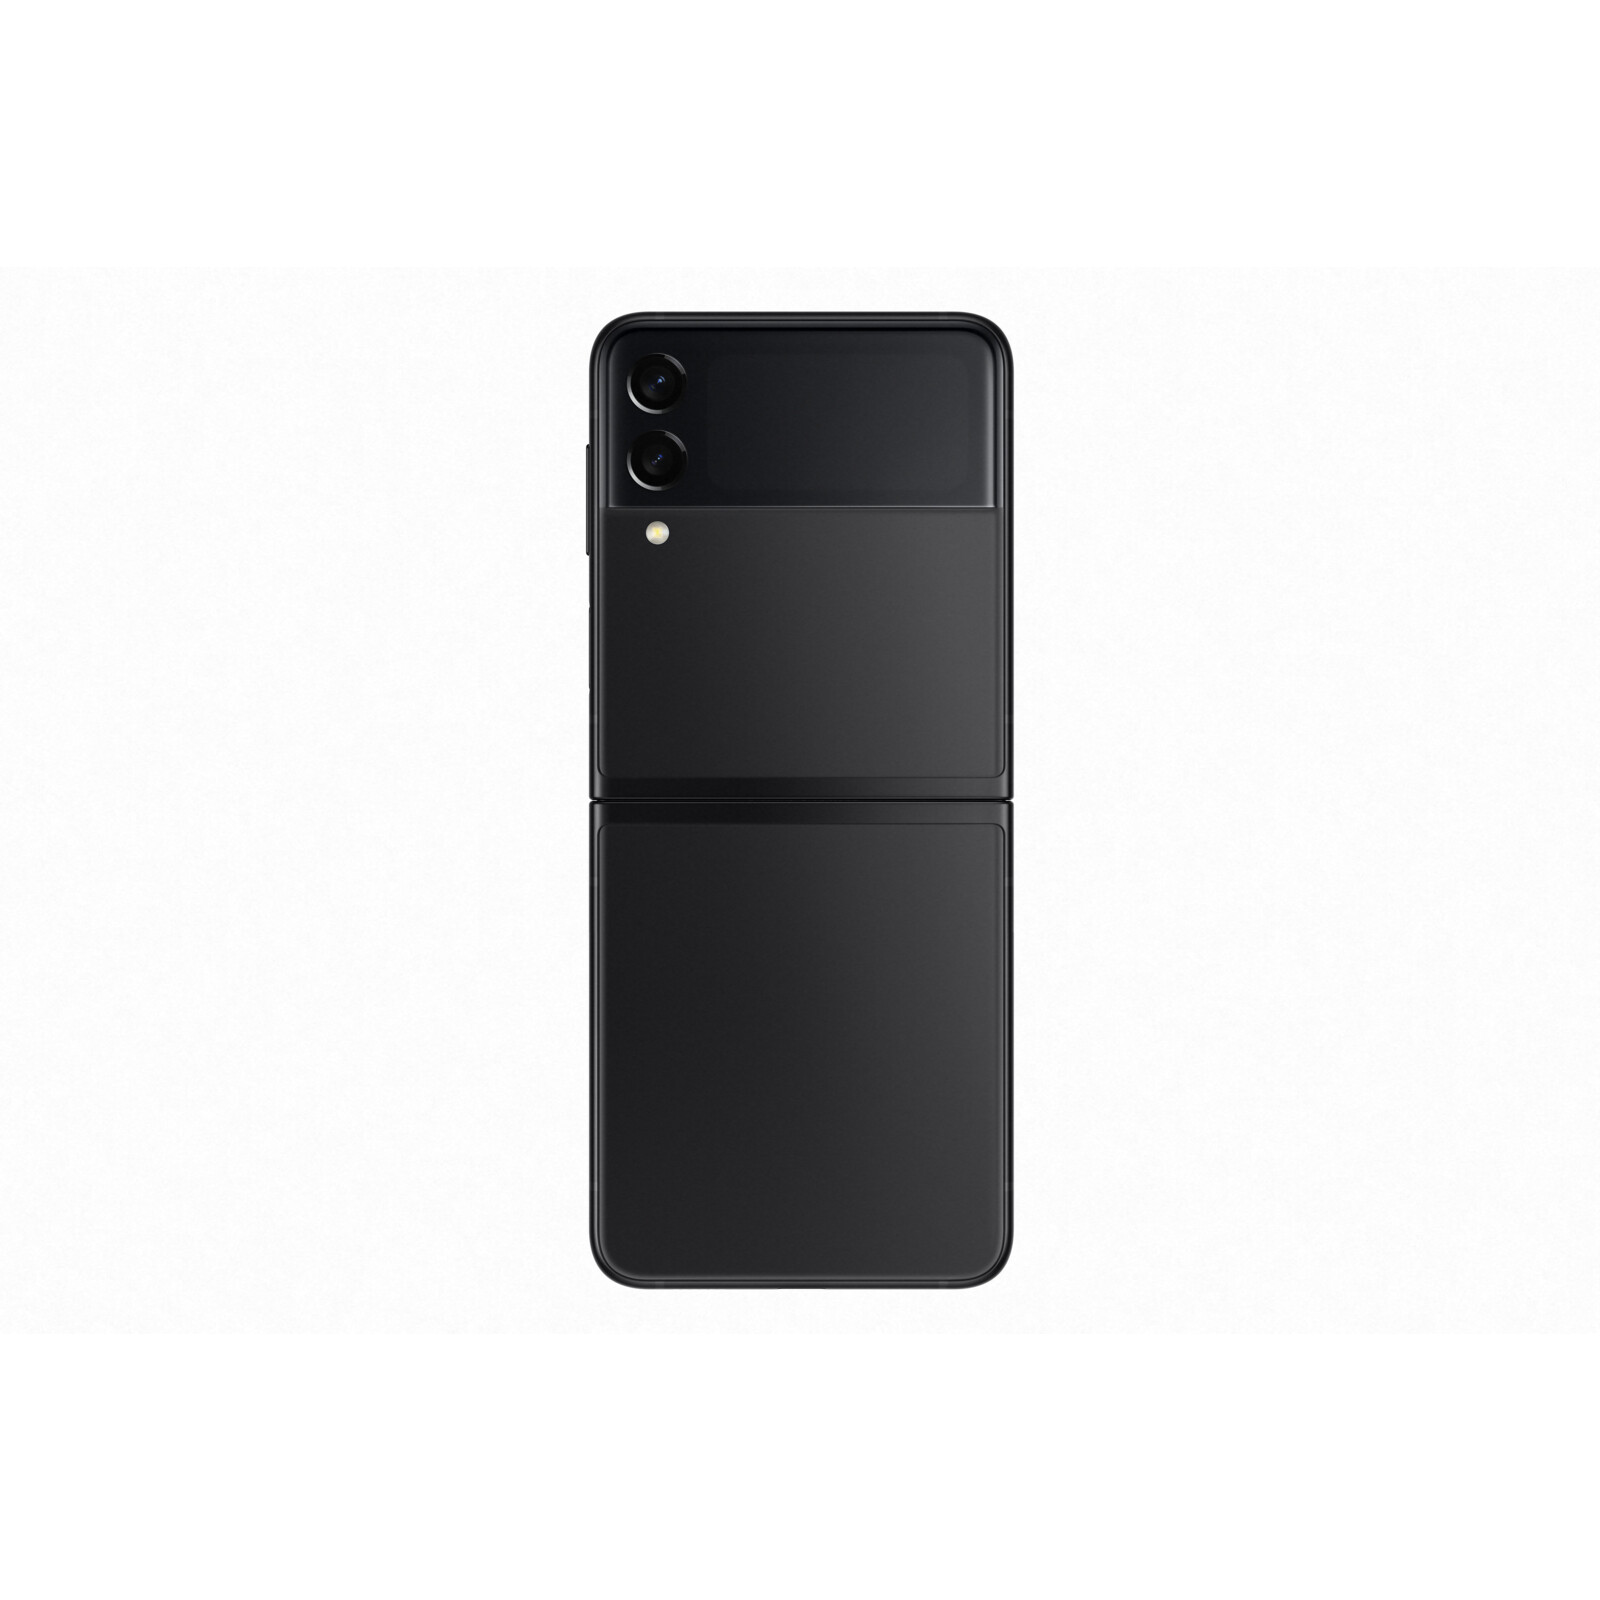 Samsung Galaxy Z Flip phanom black